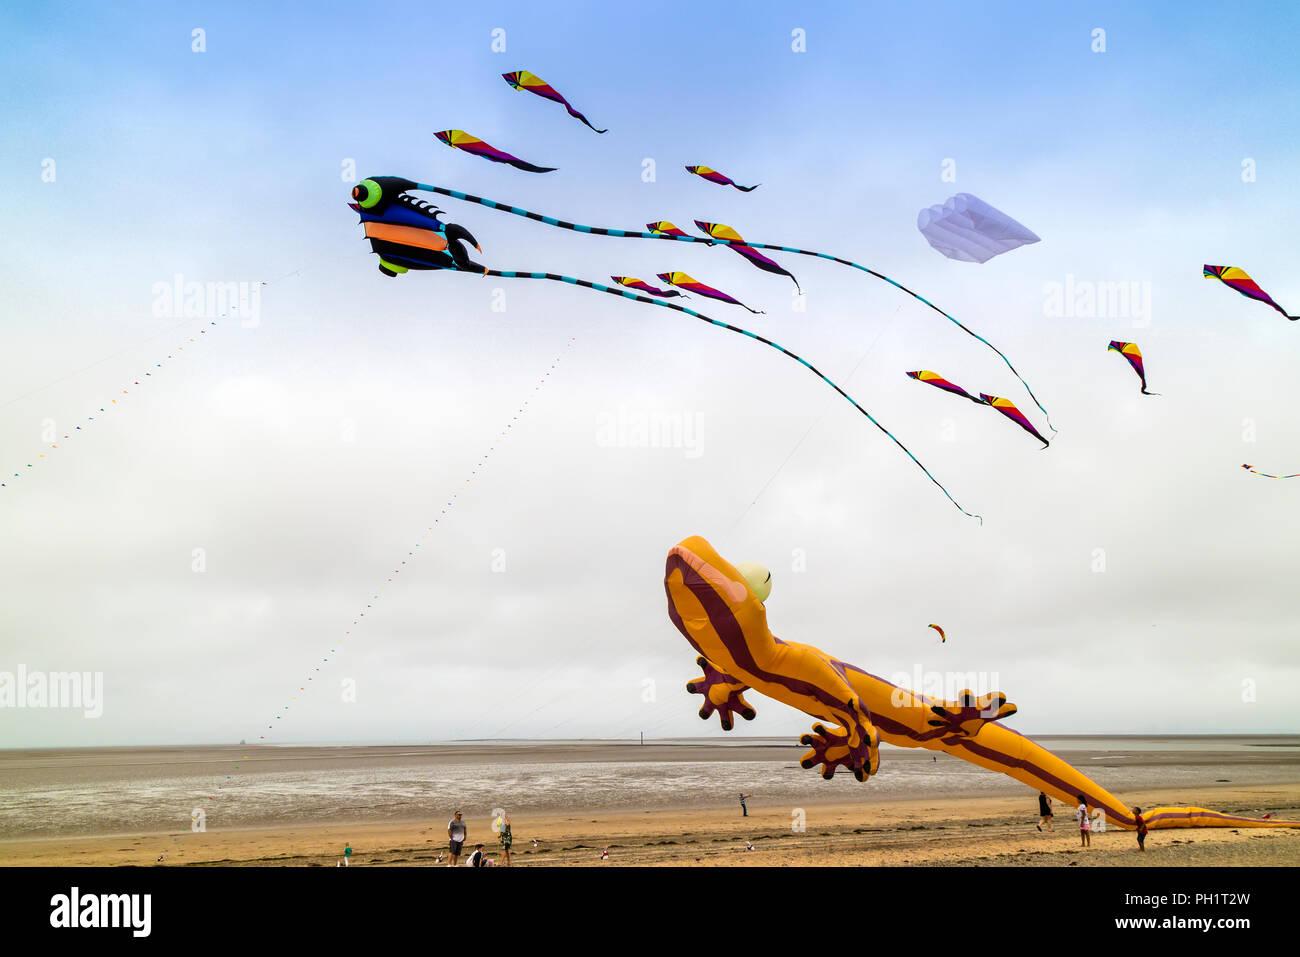 Flying kites on a sandy beach in summertime. - Stock Image